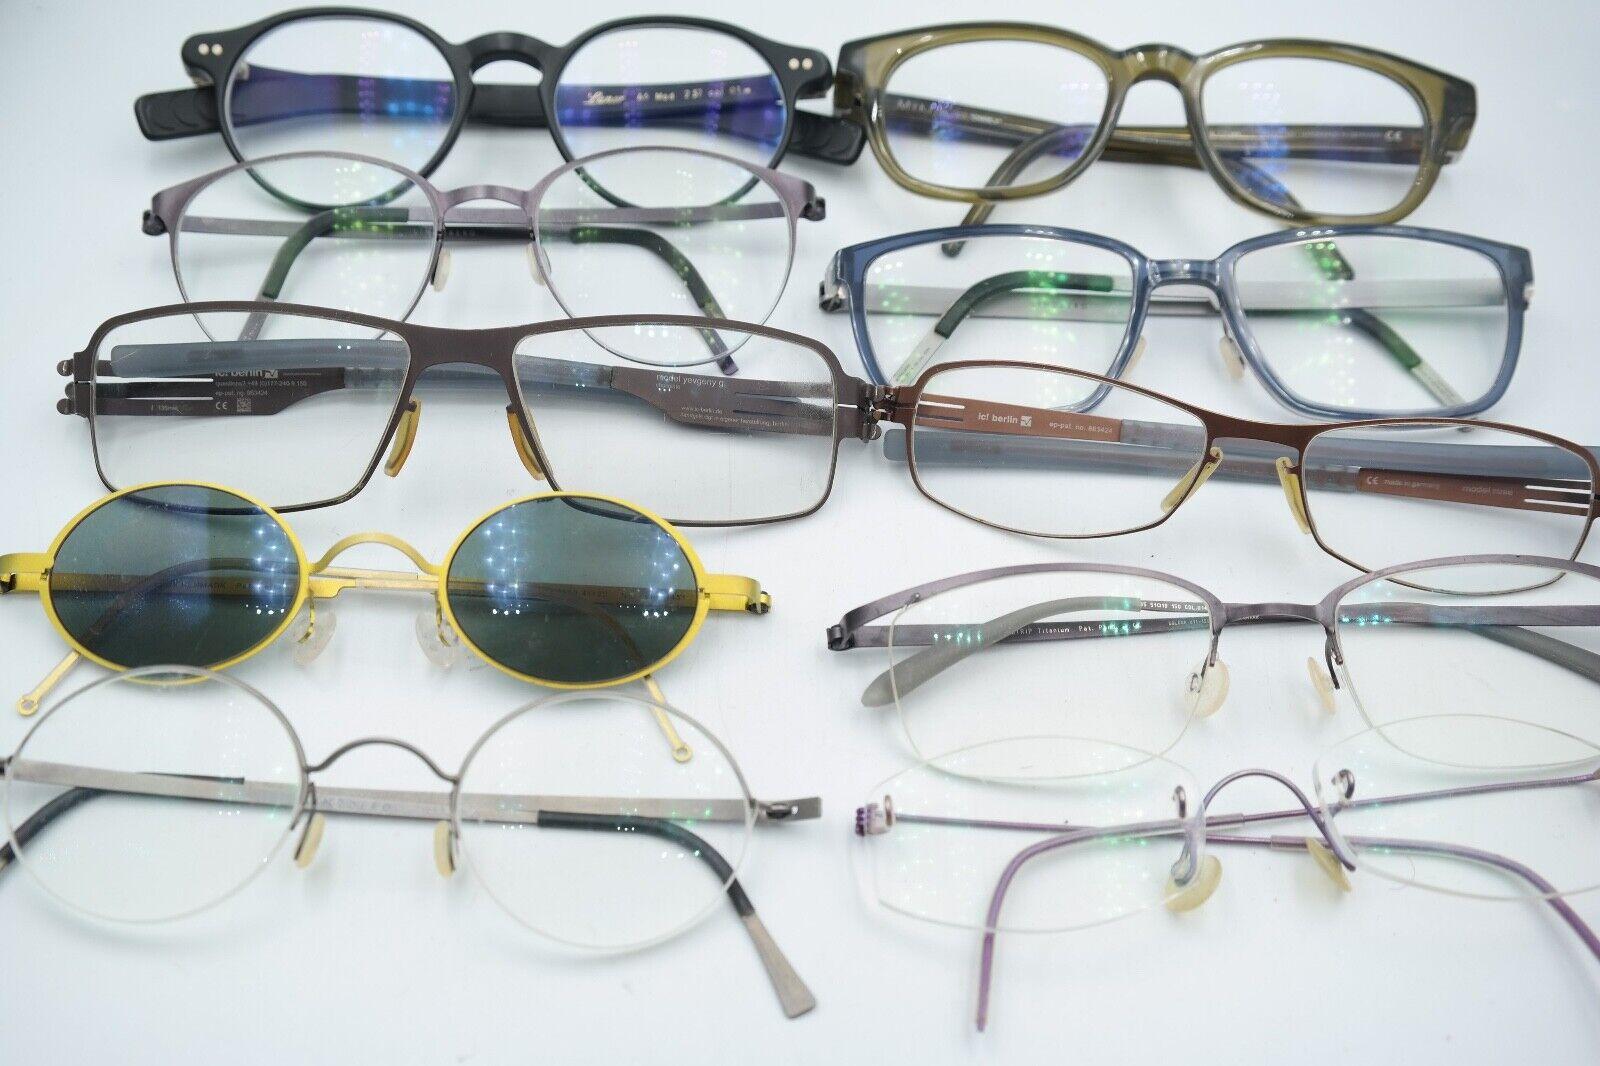 10 x Brille Brillengestell Paket Lot Konvolut Lindberg Mykita Lunor IC Berlin